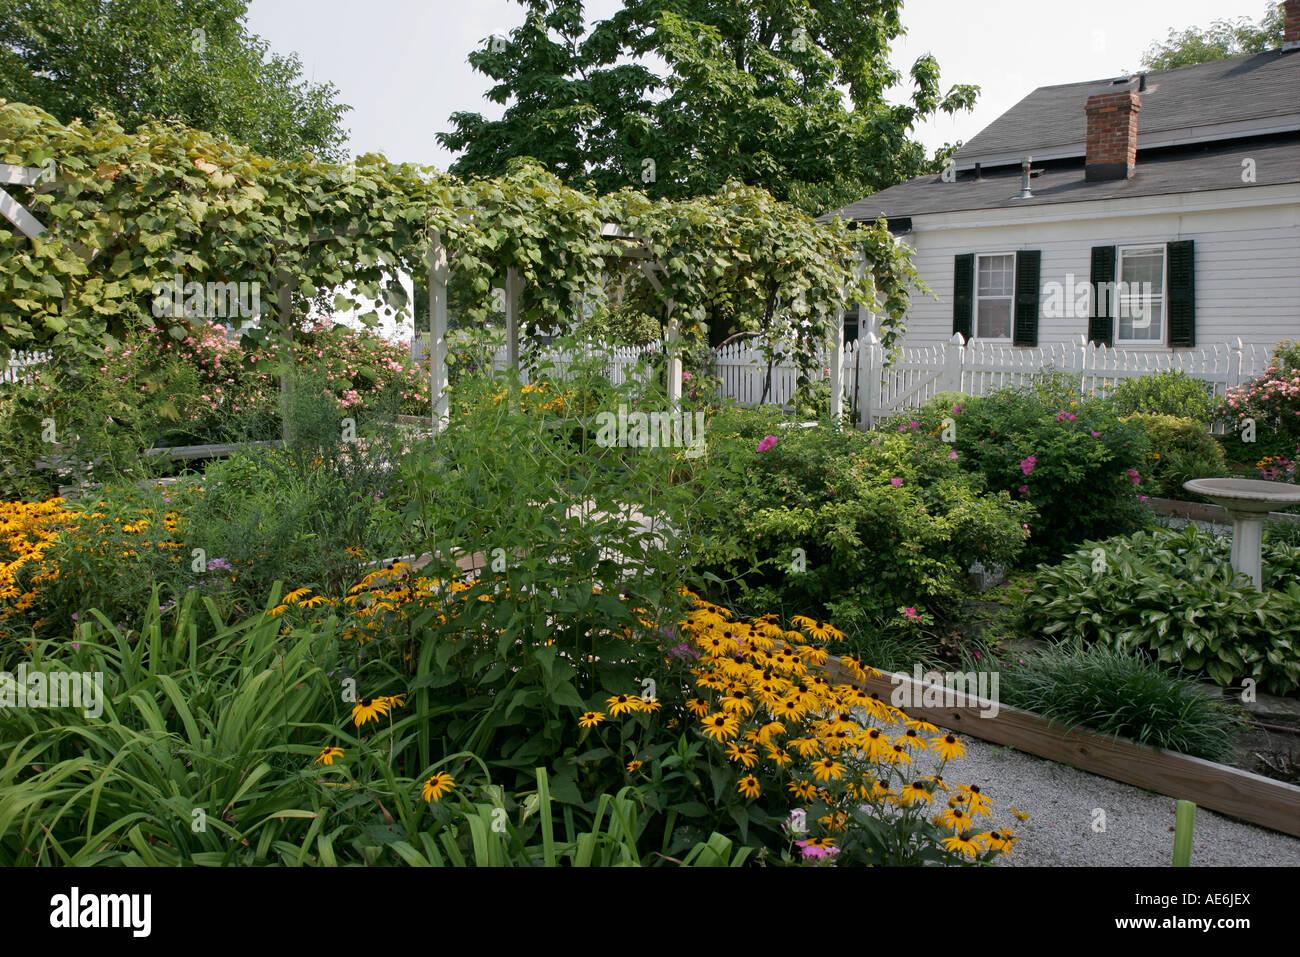 Toledo Ohio Maumee River Road Wolcott House Museum built 1827 garden - Stock Image